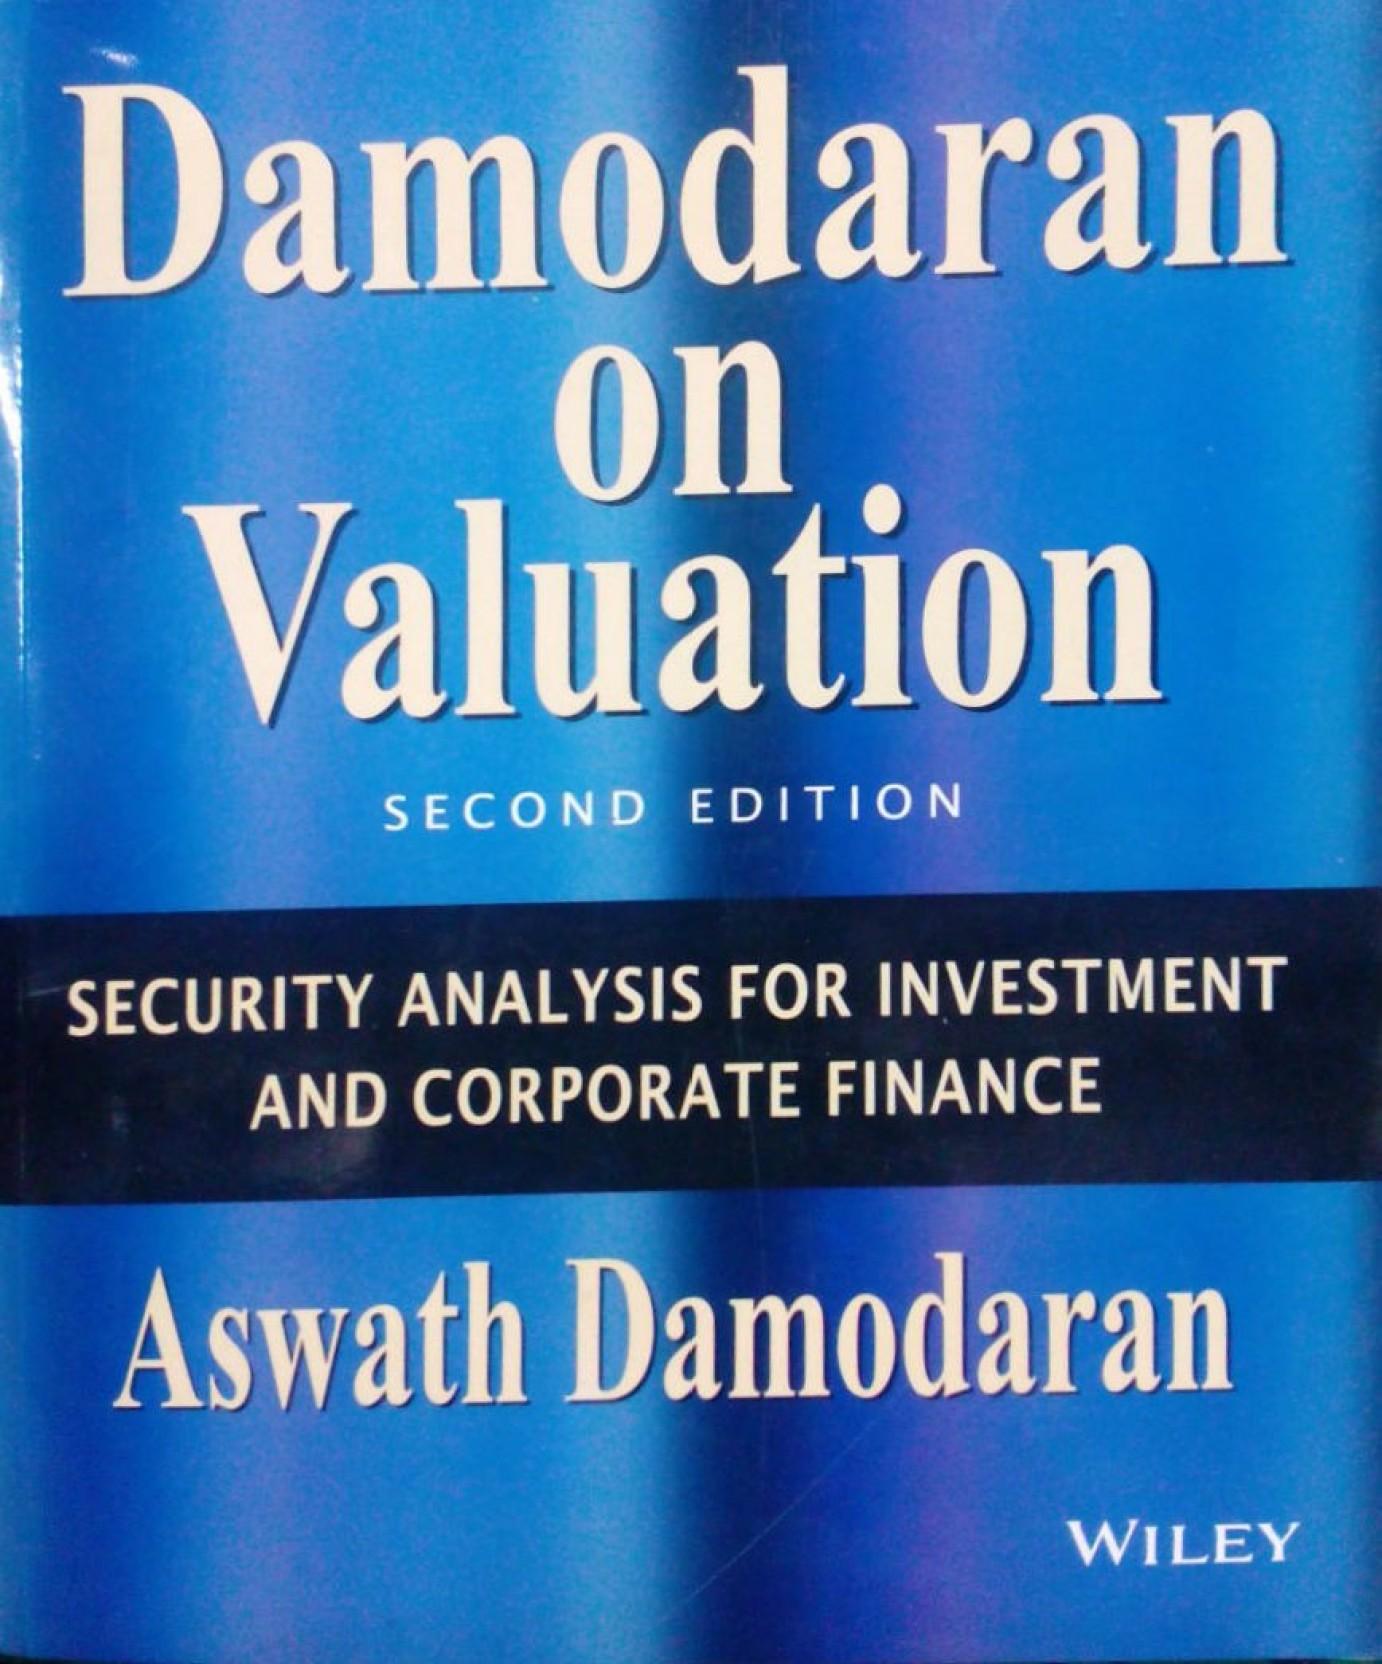 Damodaran pdf aswath